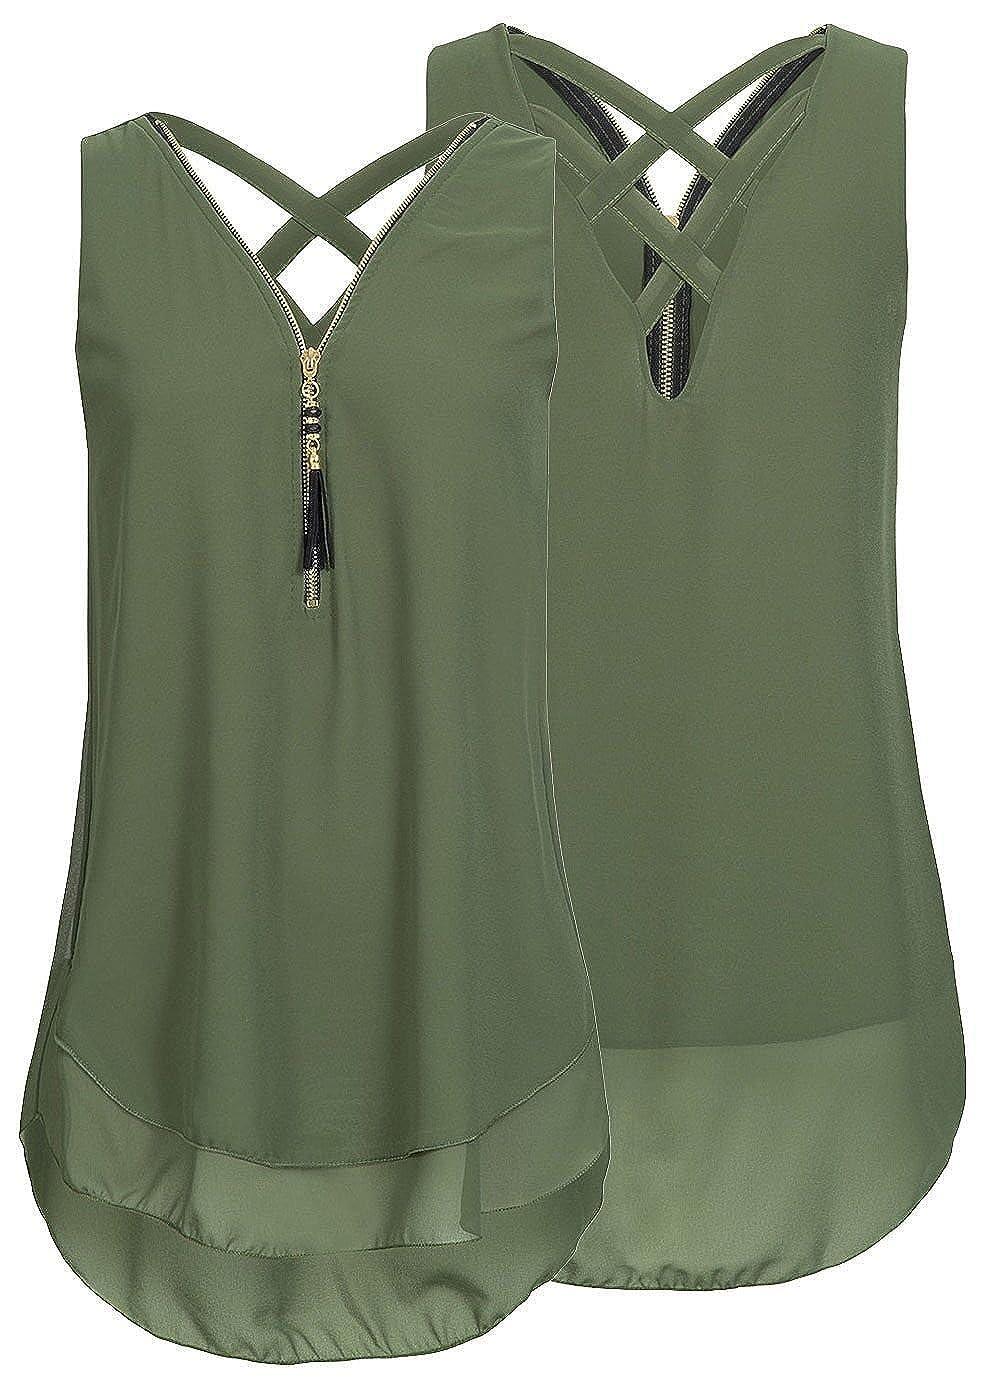 Yknktstc Womens Sleeveless Tank Top Chiffon Double Layers Casual Blouse Tunic Top T Shirt